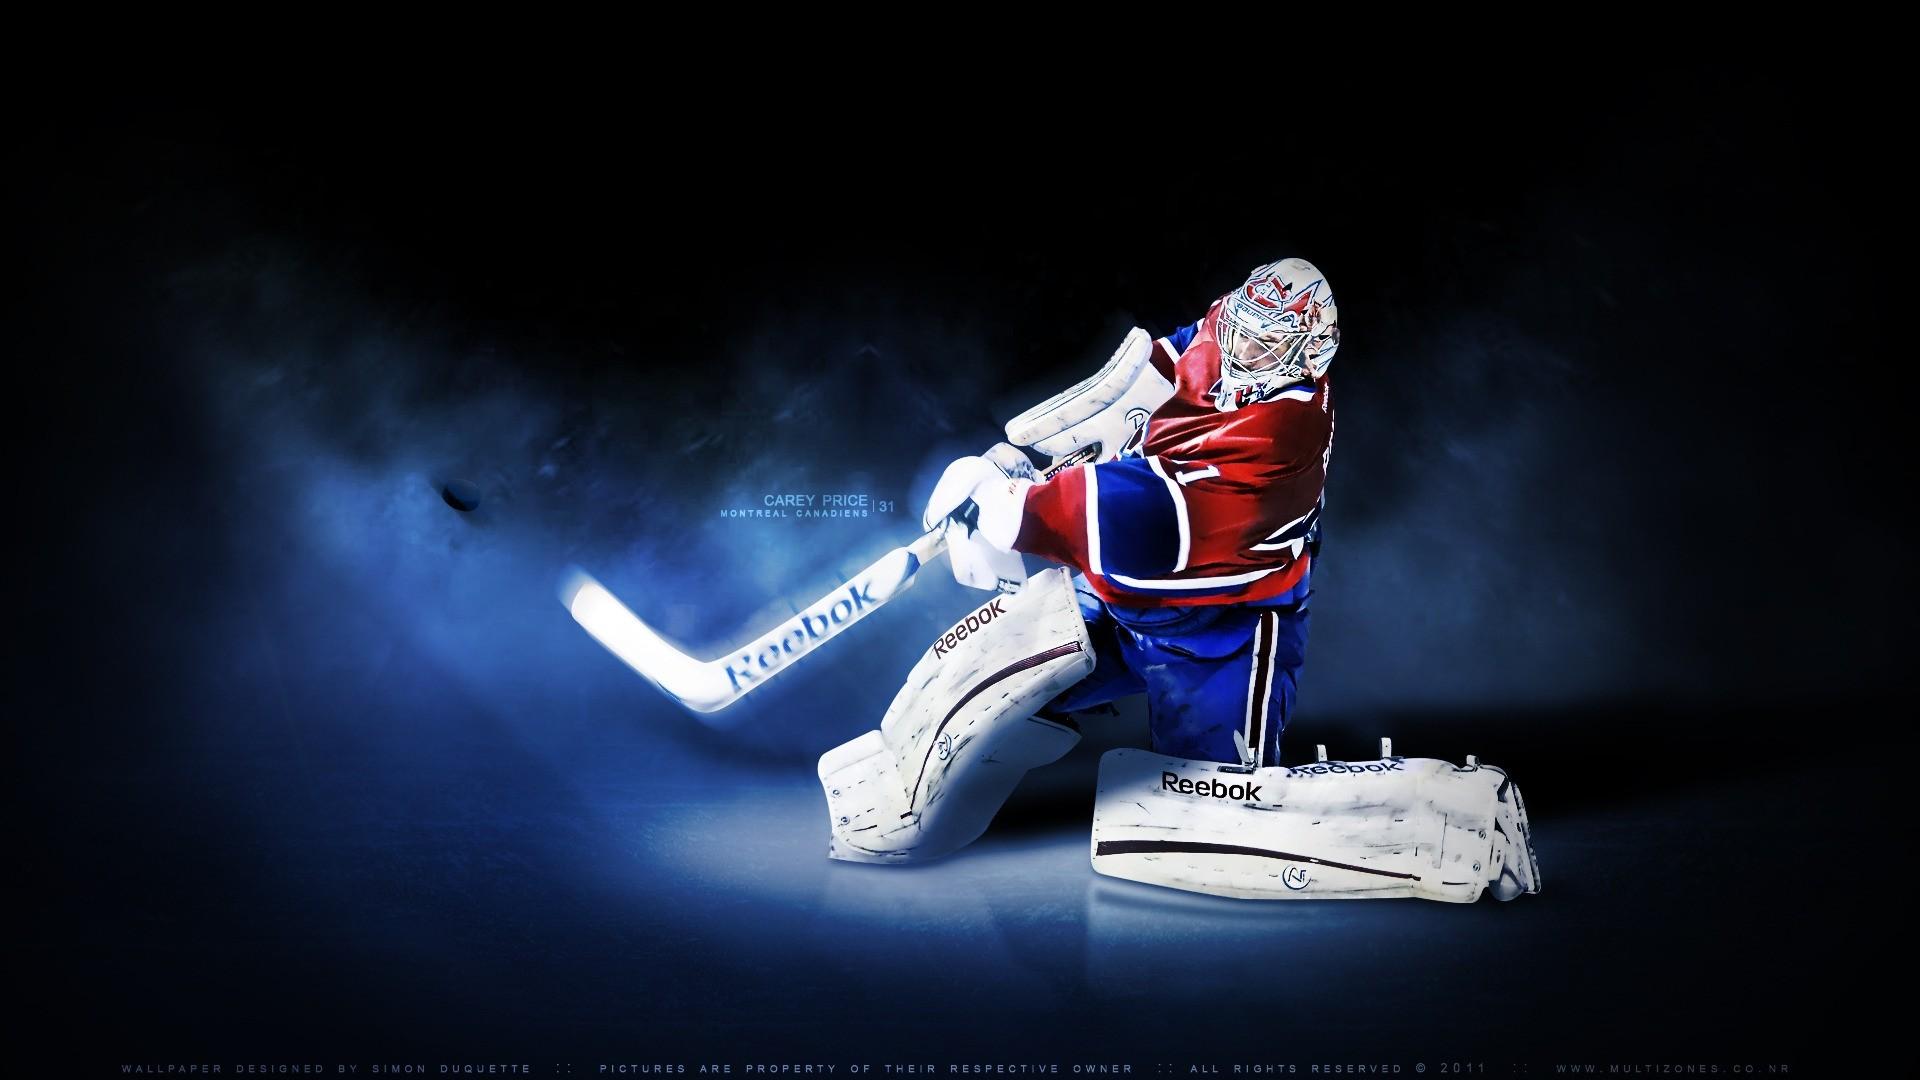 Hockey High Quality